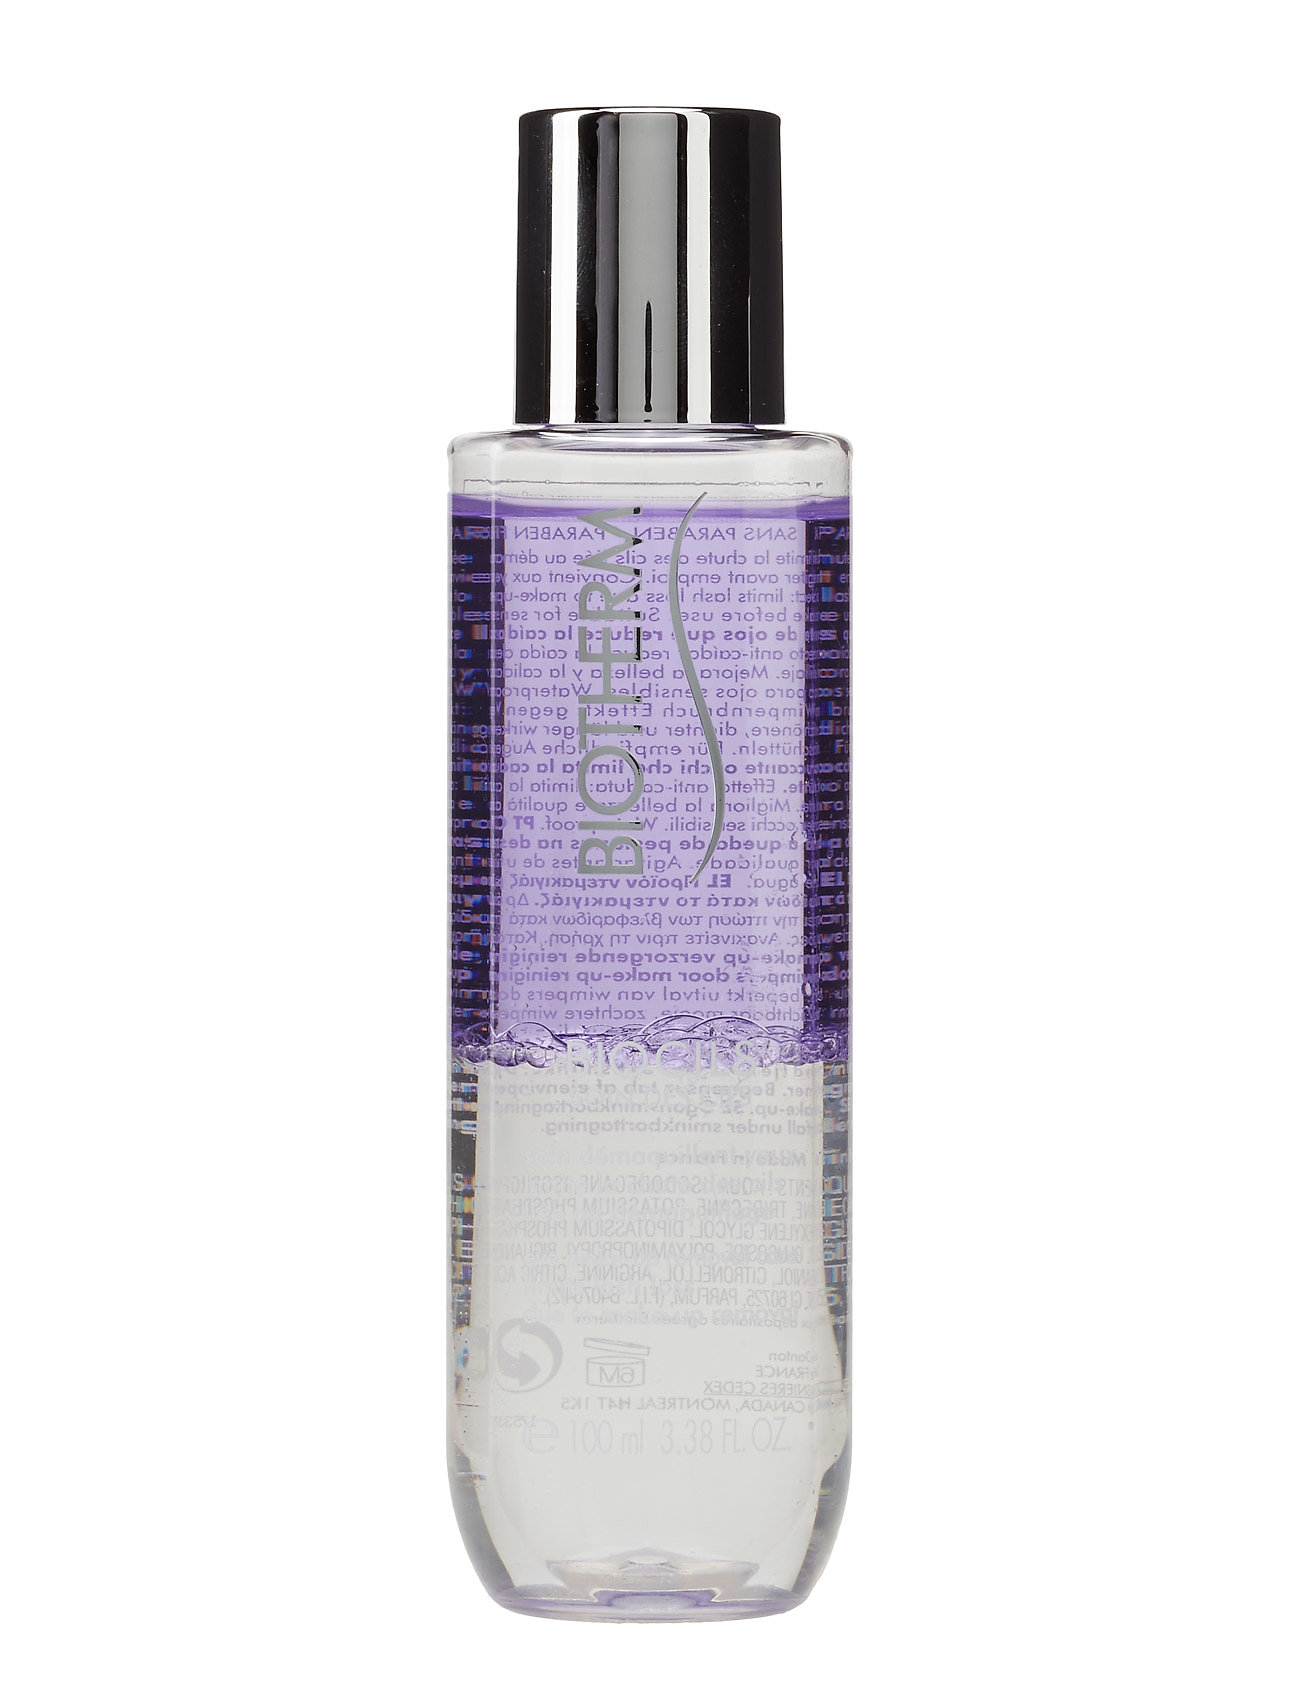 biotherm – Biocils anti chute makeup remover 100 ml på boozt.com dk